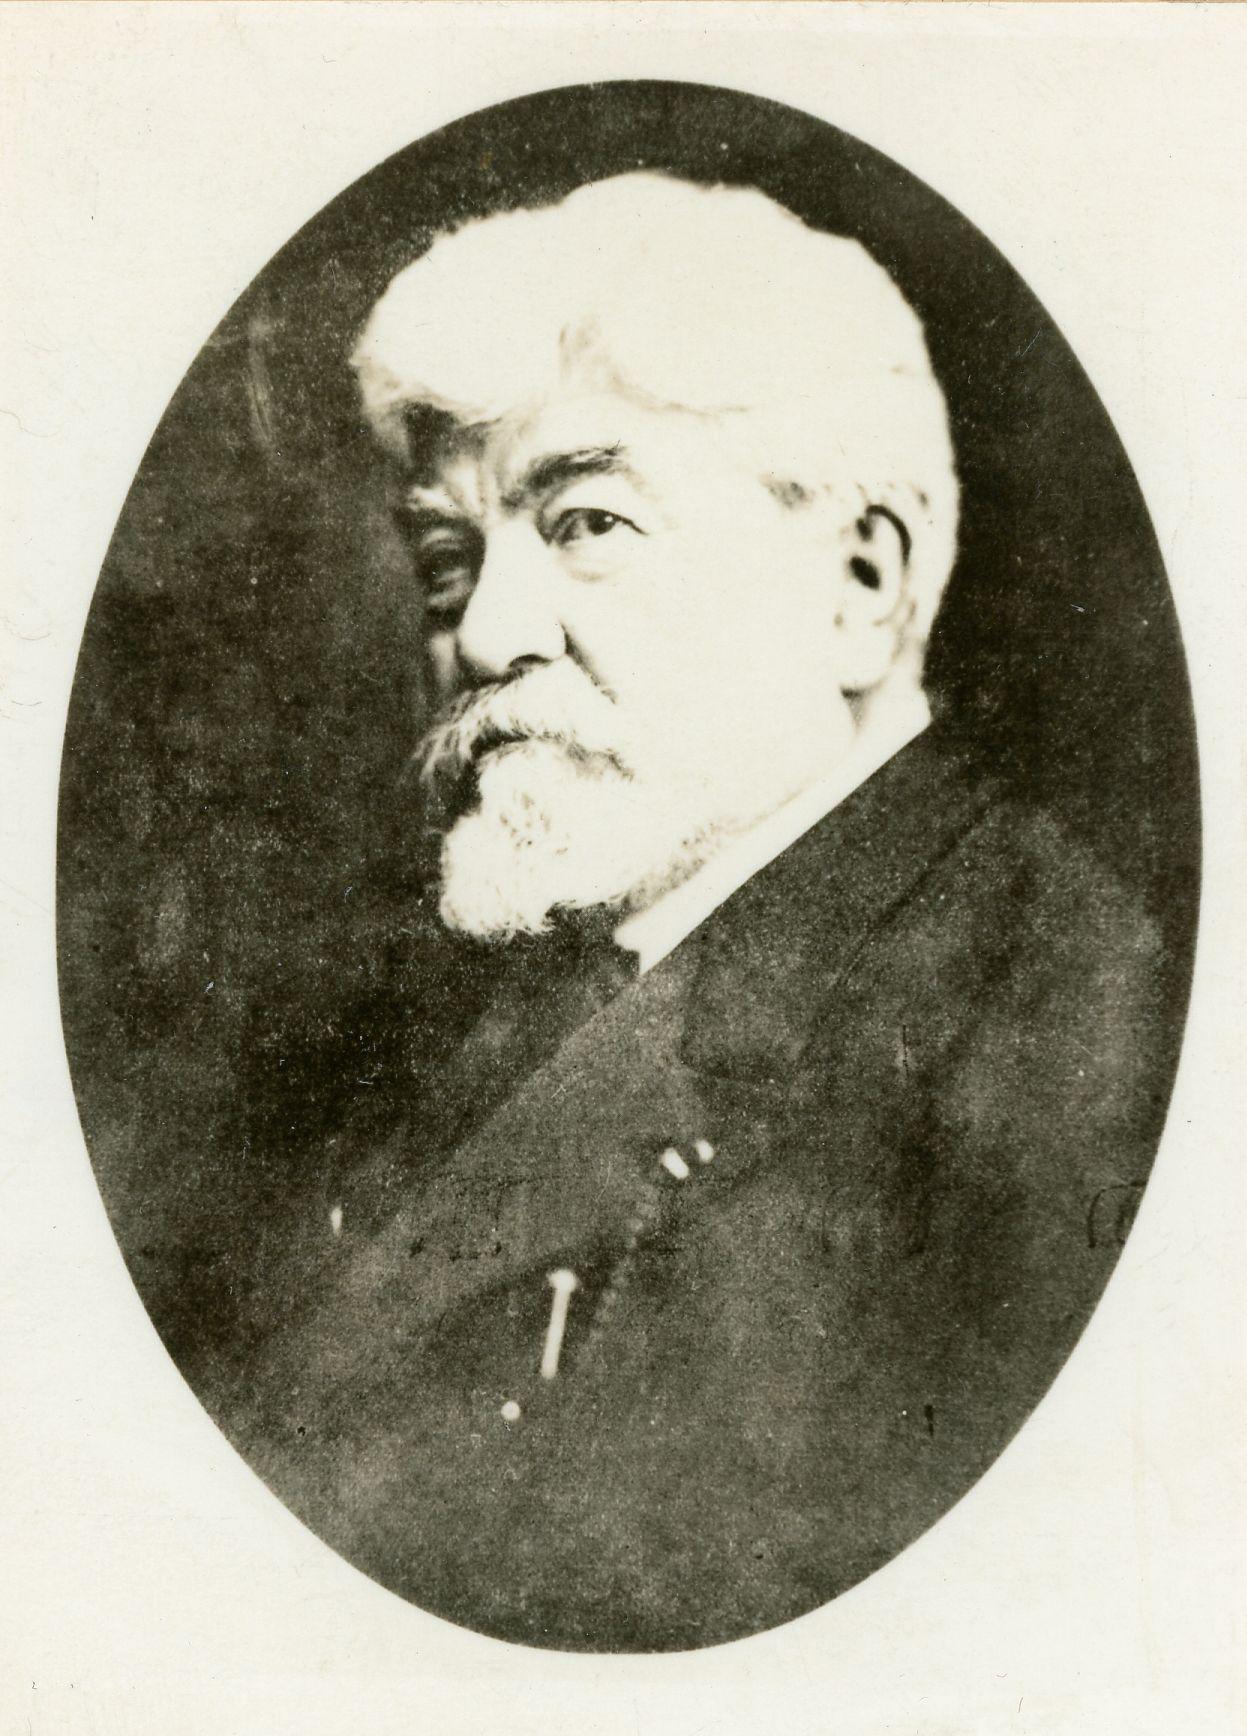 Ion Cantacuzino (1863-1934)